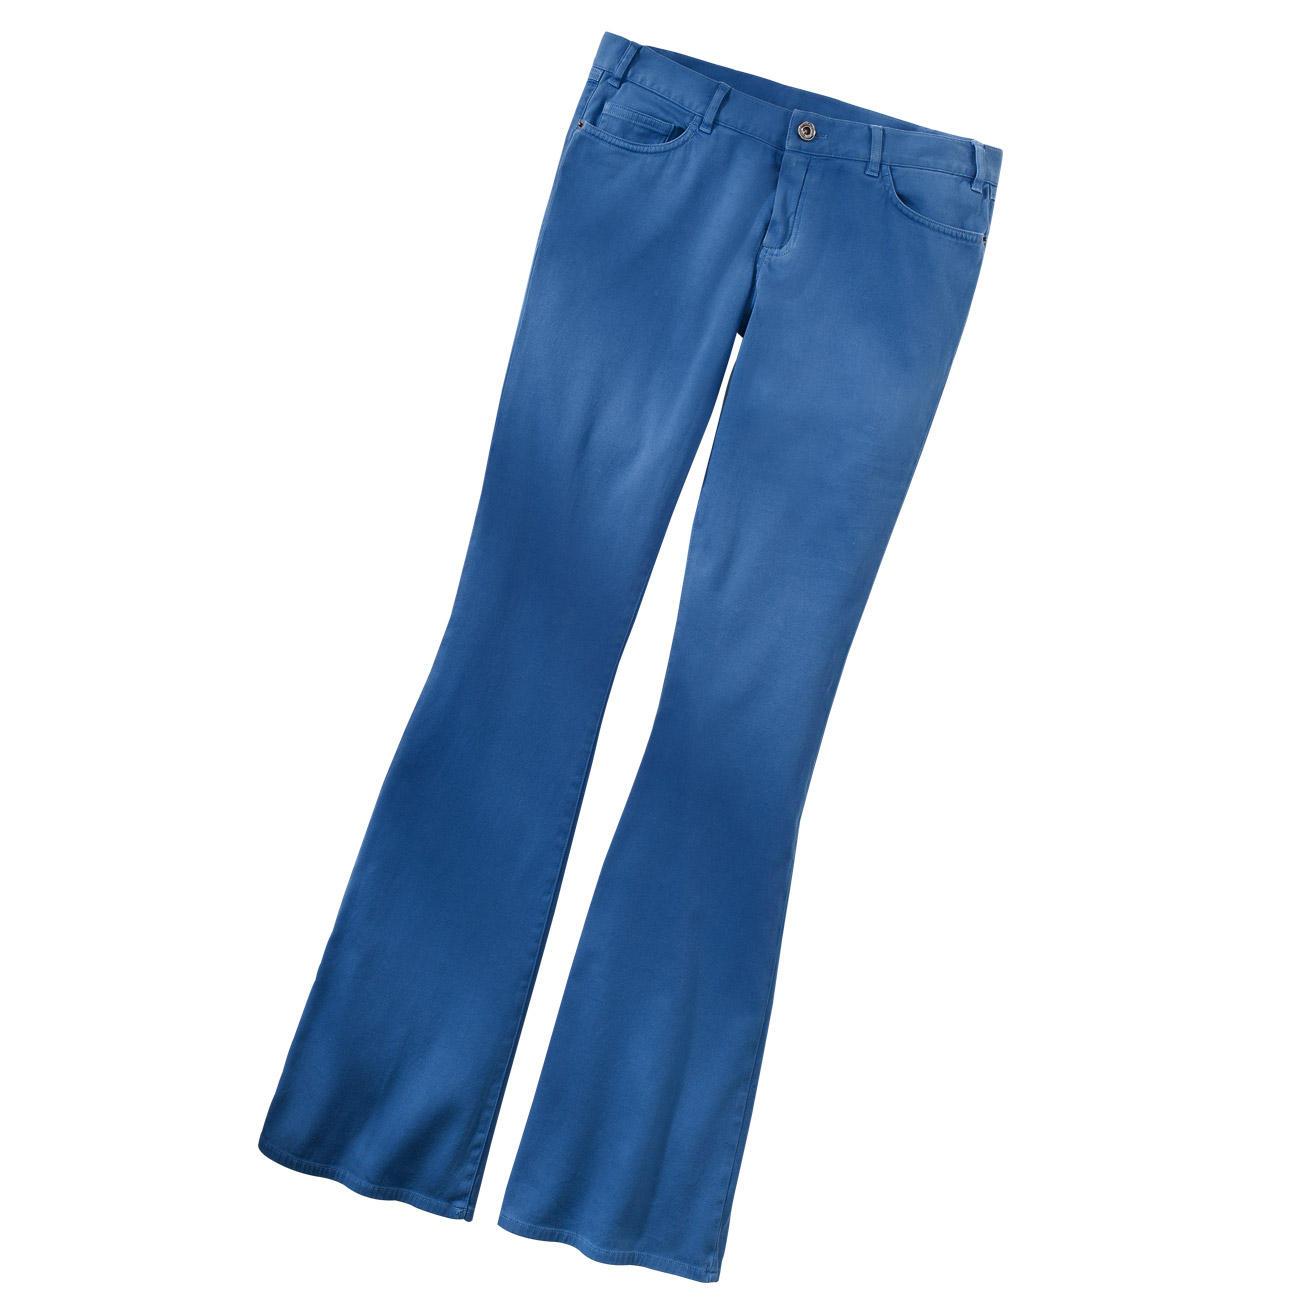 Strenesse Blue Flare-Jeans :: Blau - 42 - Damen - Erwachsene